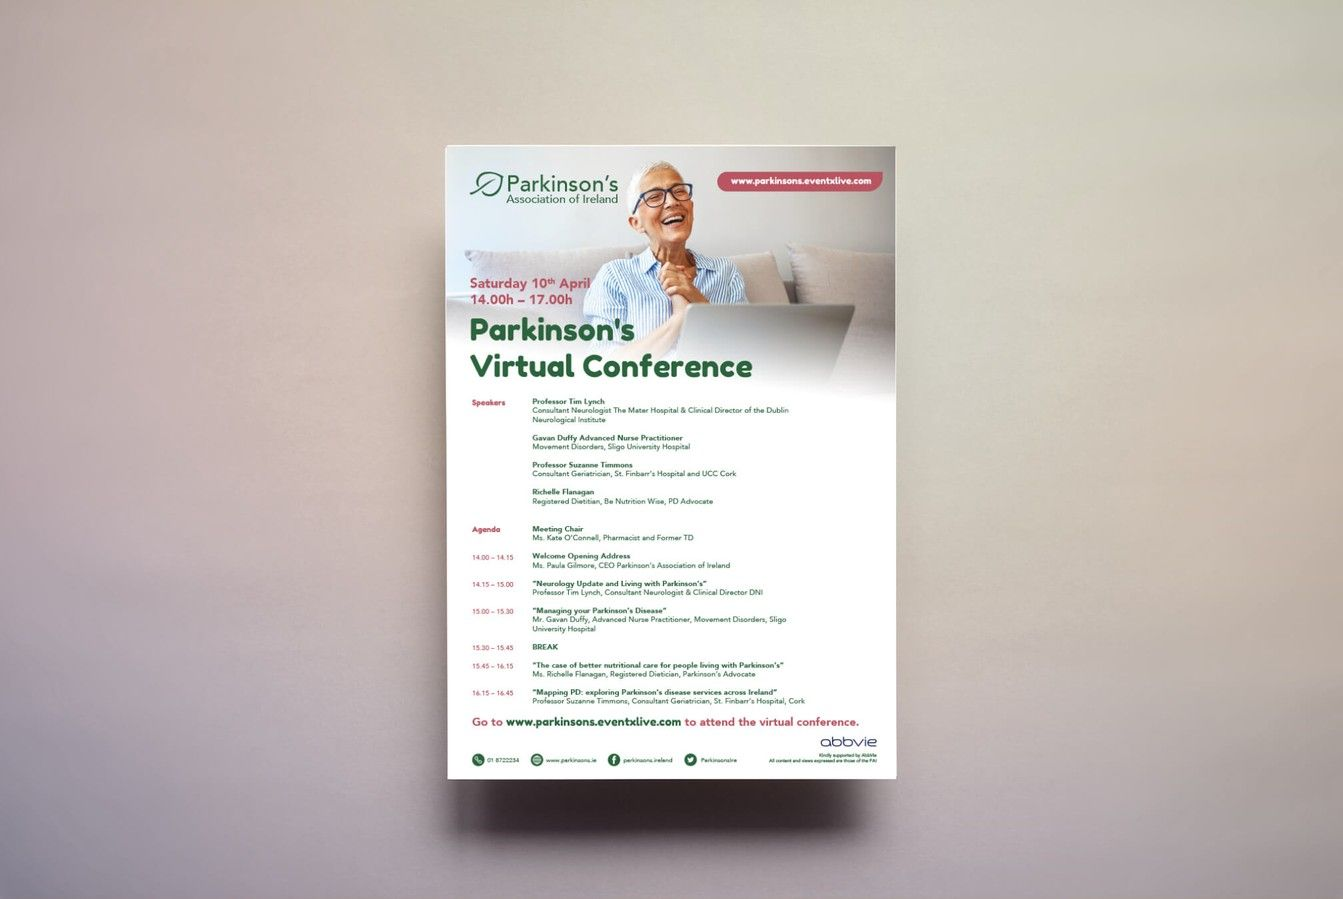 Parkinson's Association of Ireland Agenda